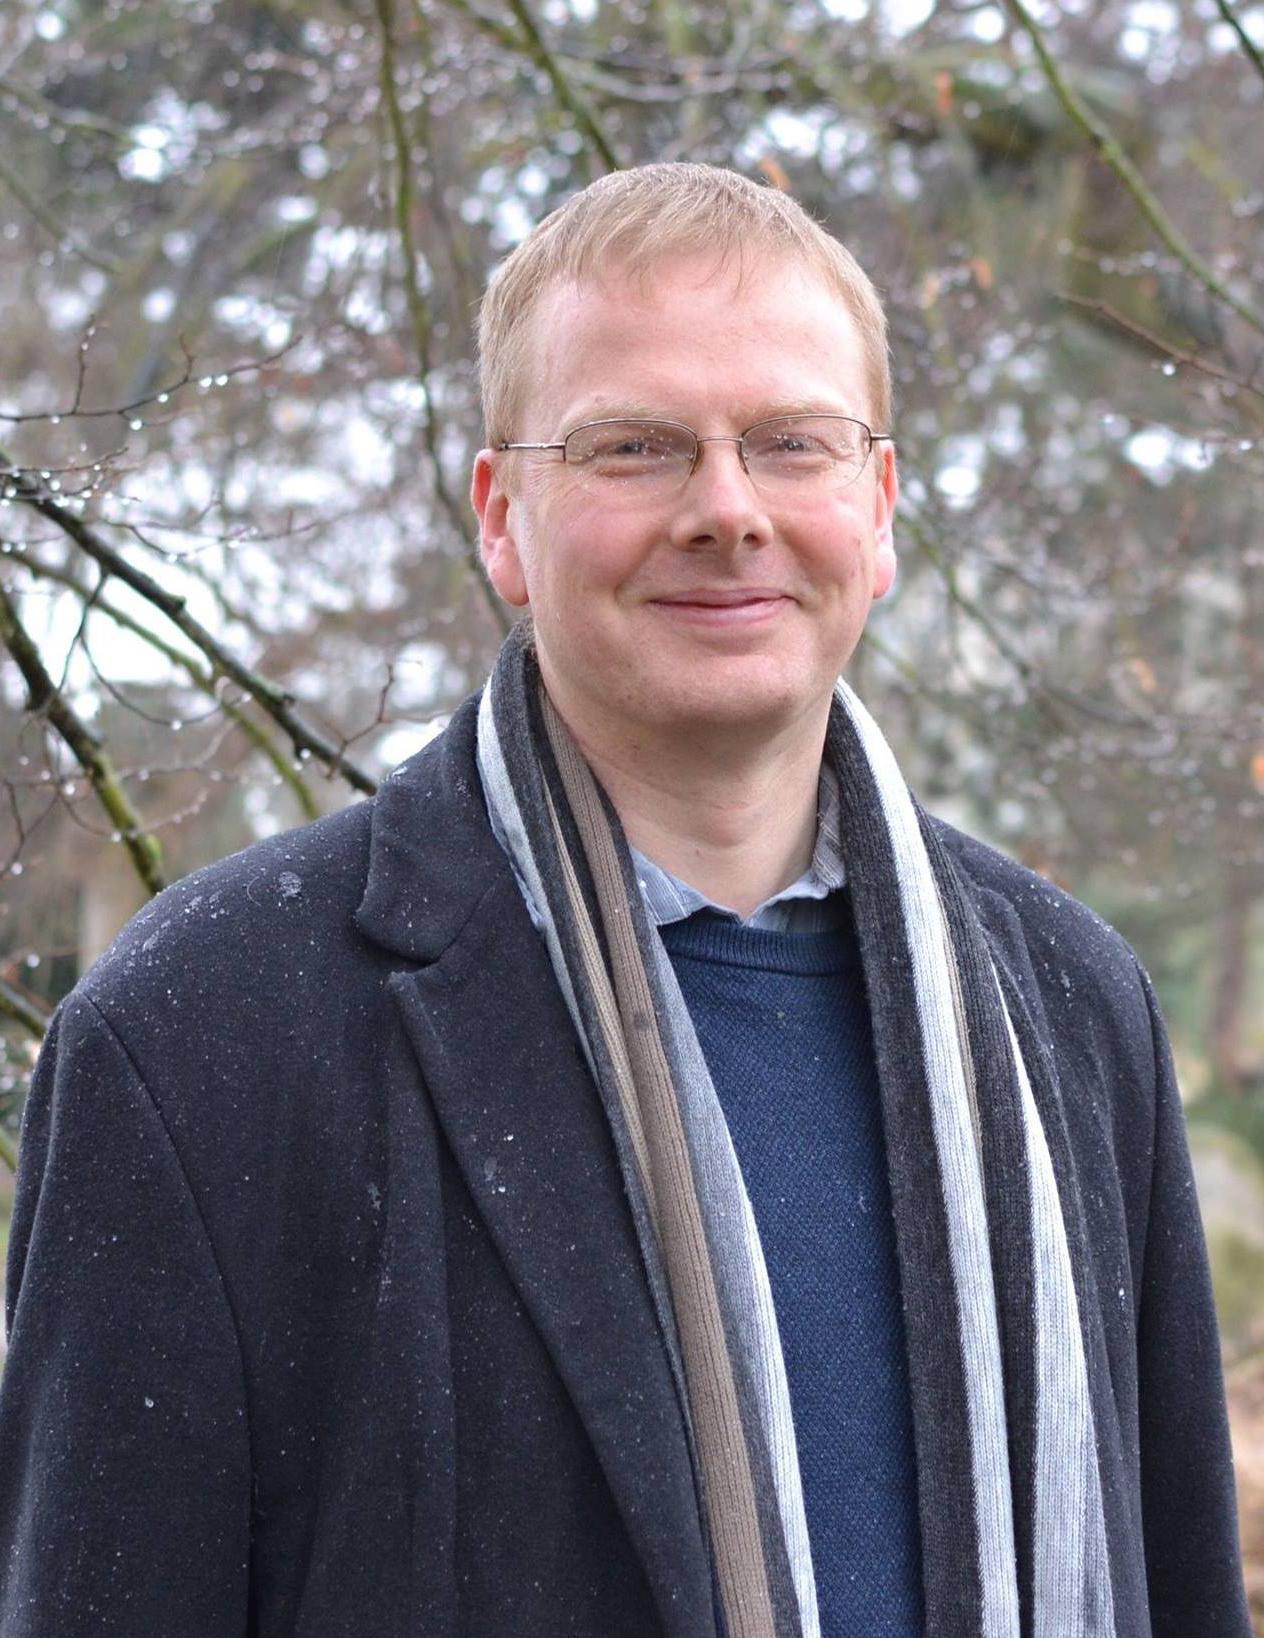 Authorised Lay Minister - Mark Liversidge